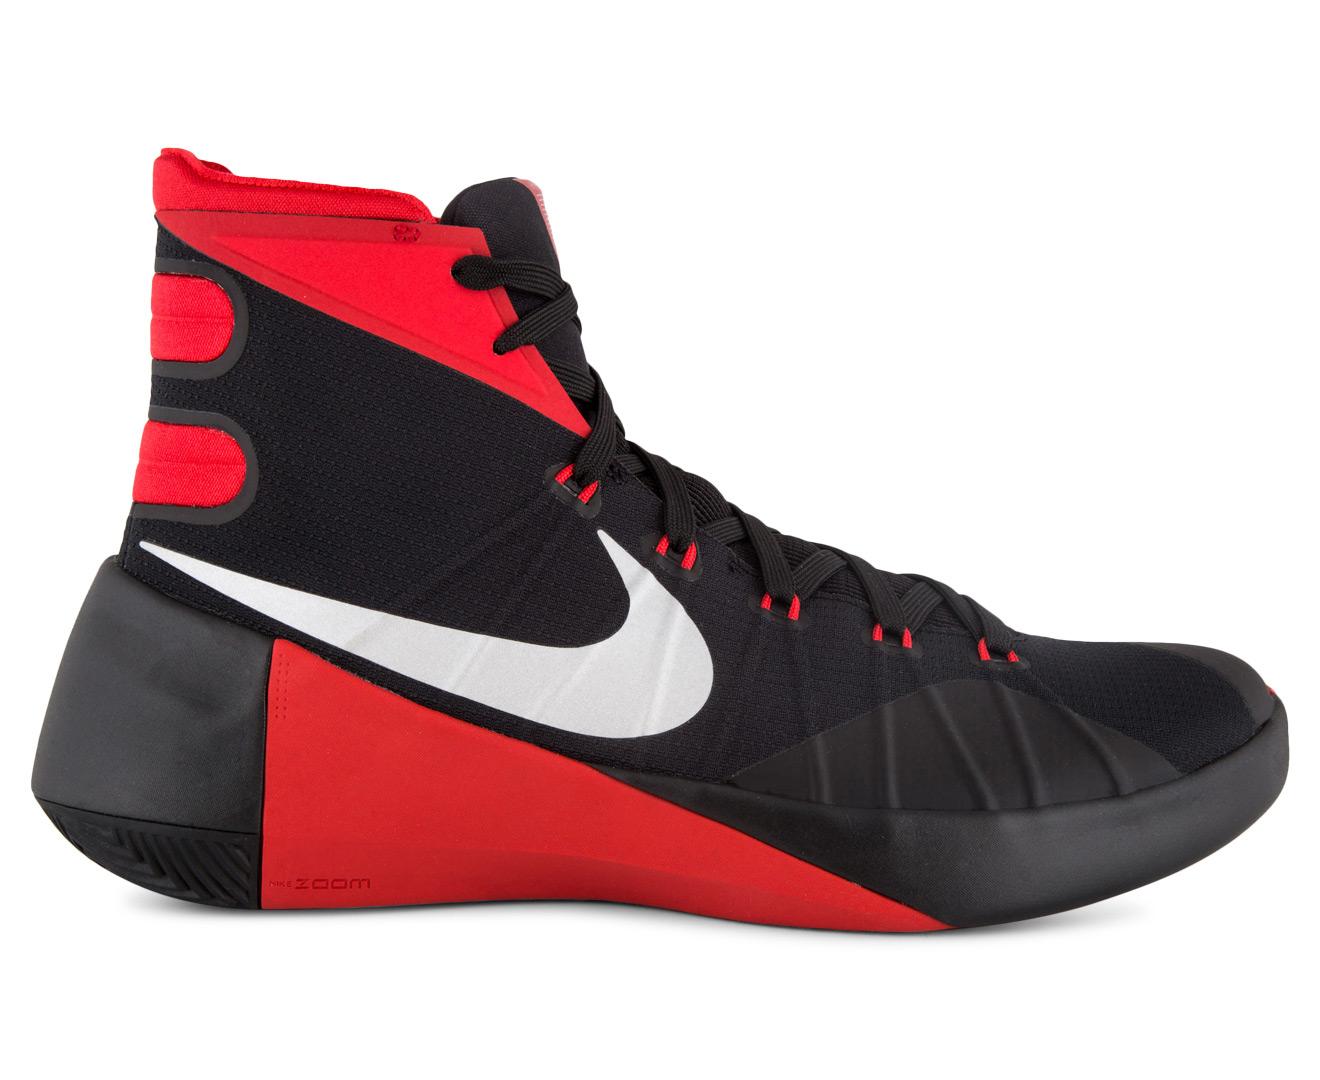 hot sale online 64844 d3848 ... uk nike mens hyperdunk 2015 basketball shoe black metallic silver  university red catch.au 07e96